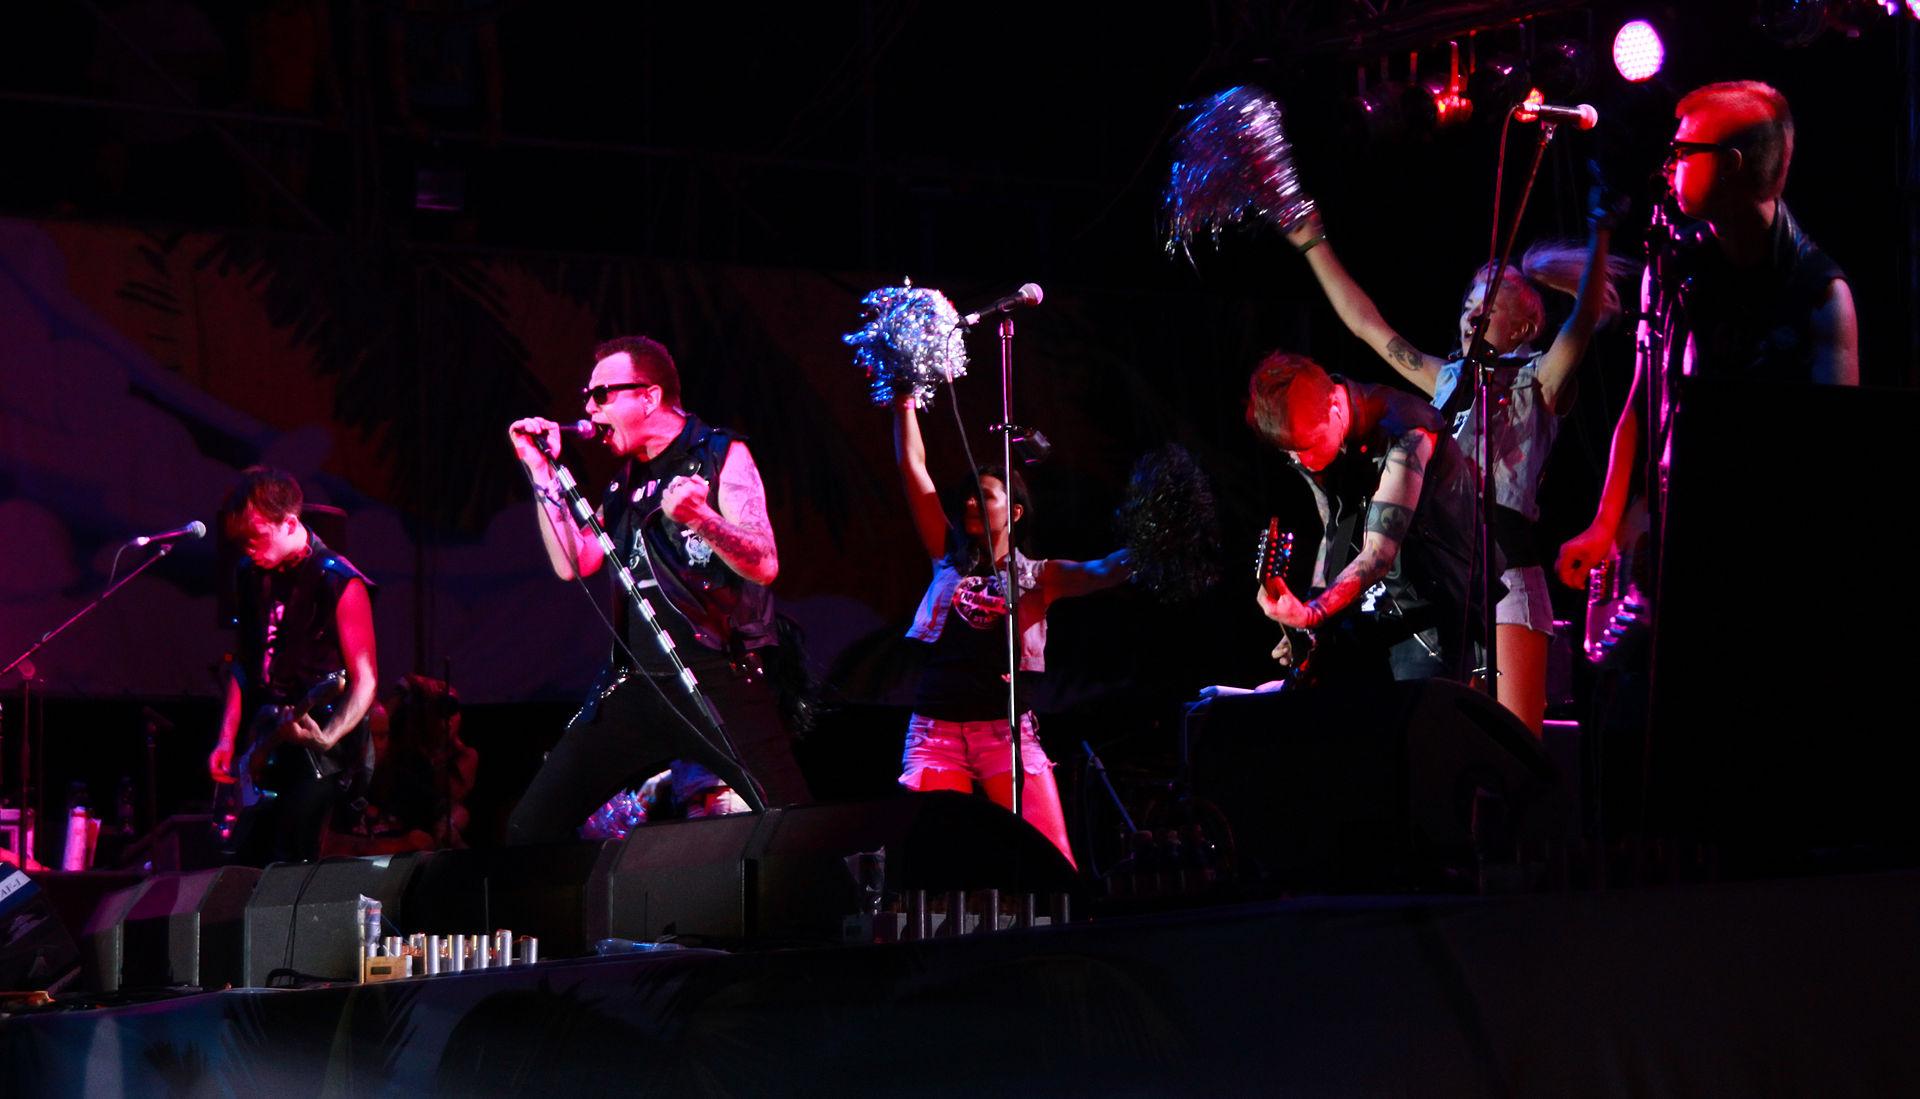 рок группа тараканы слушать